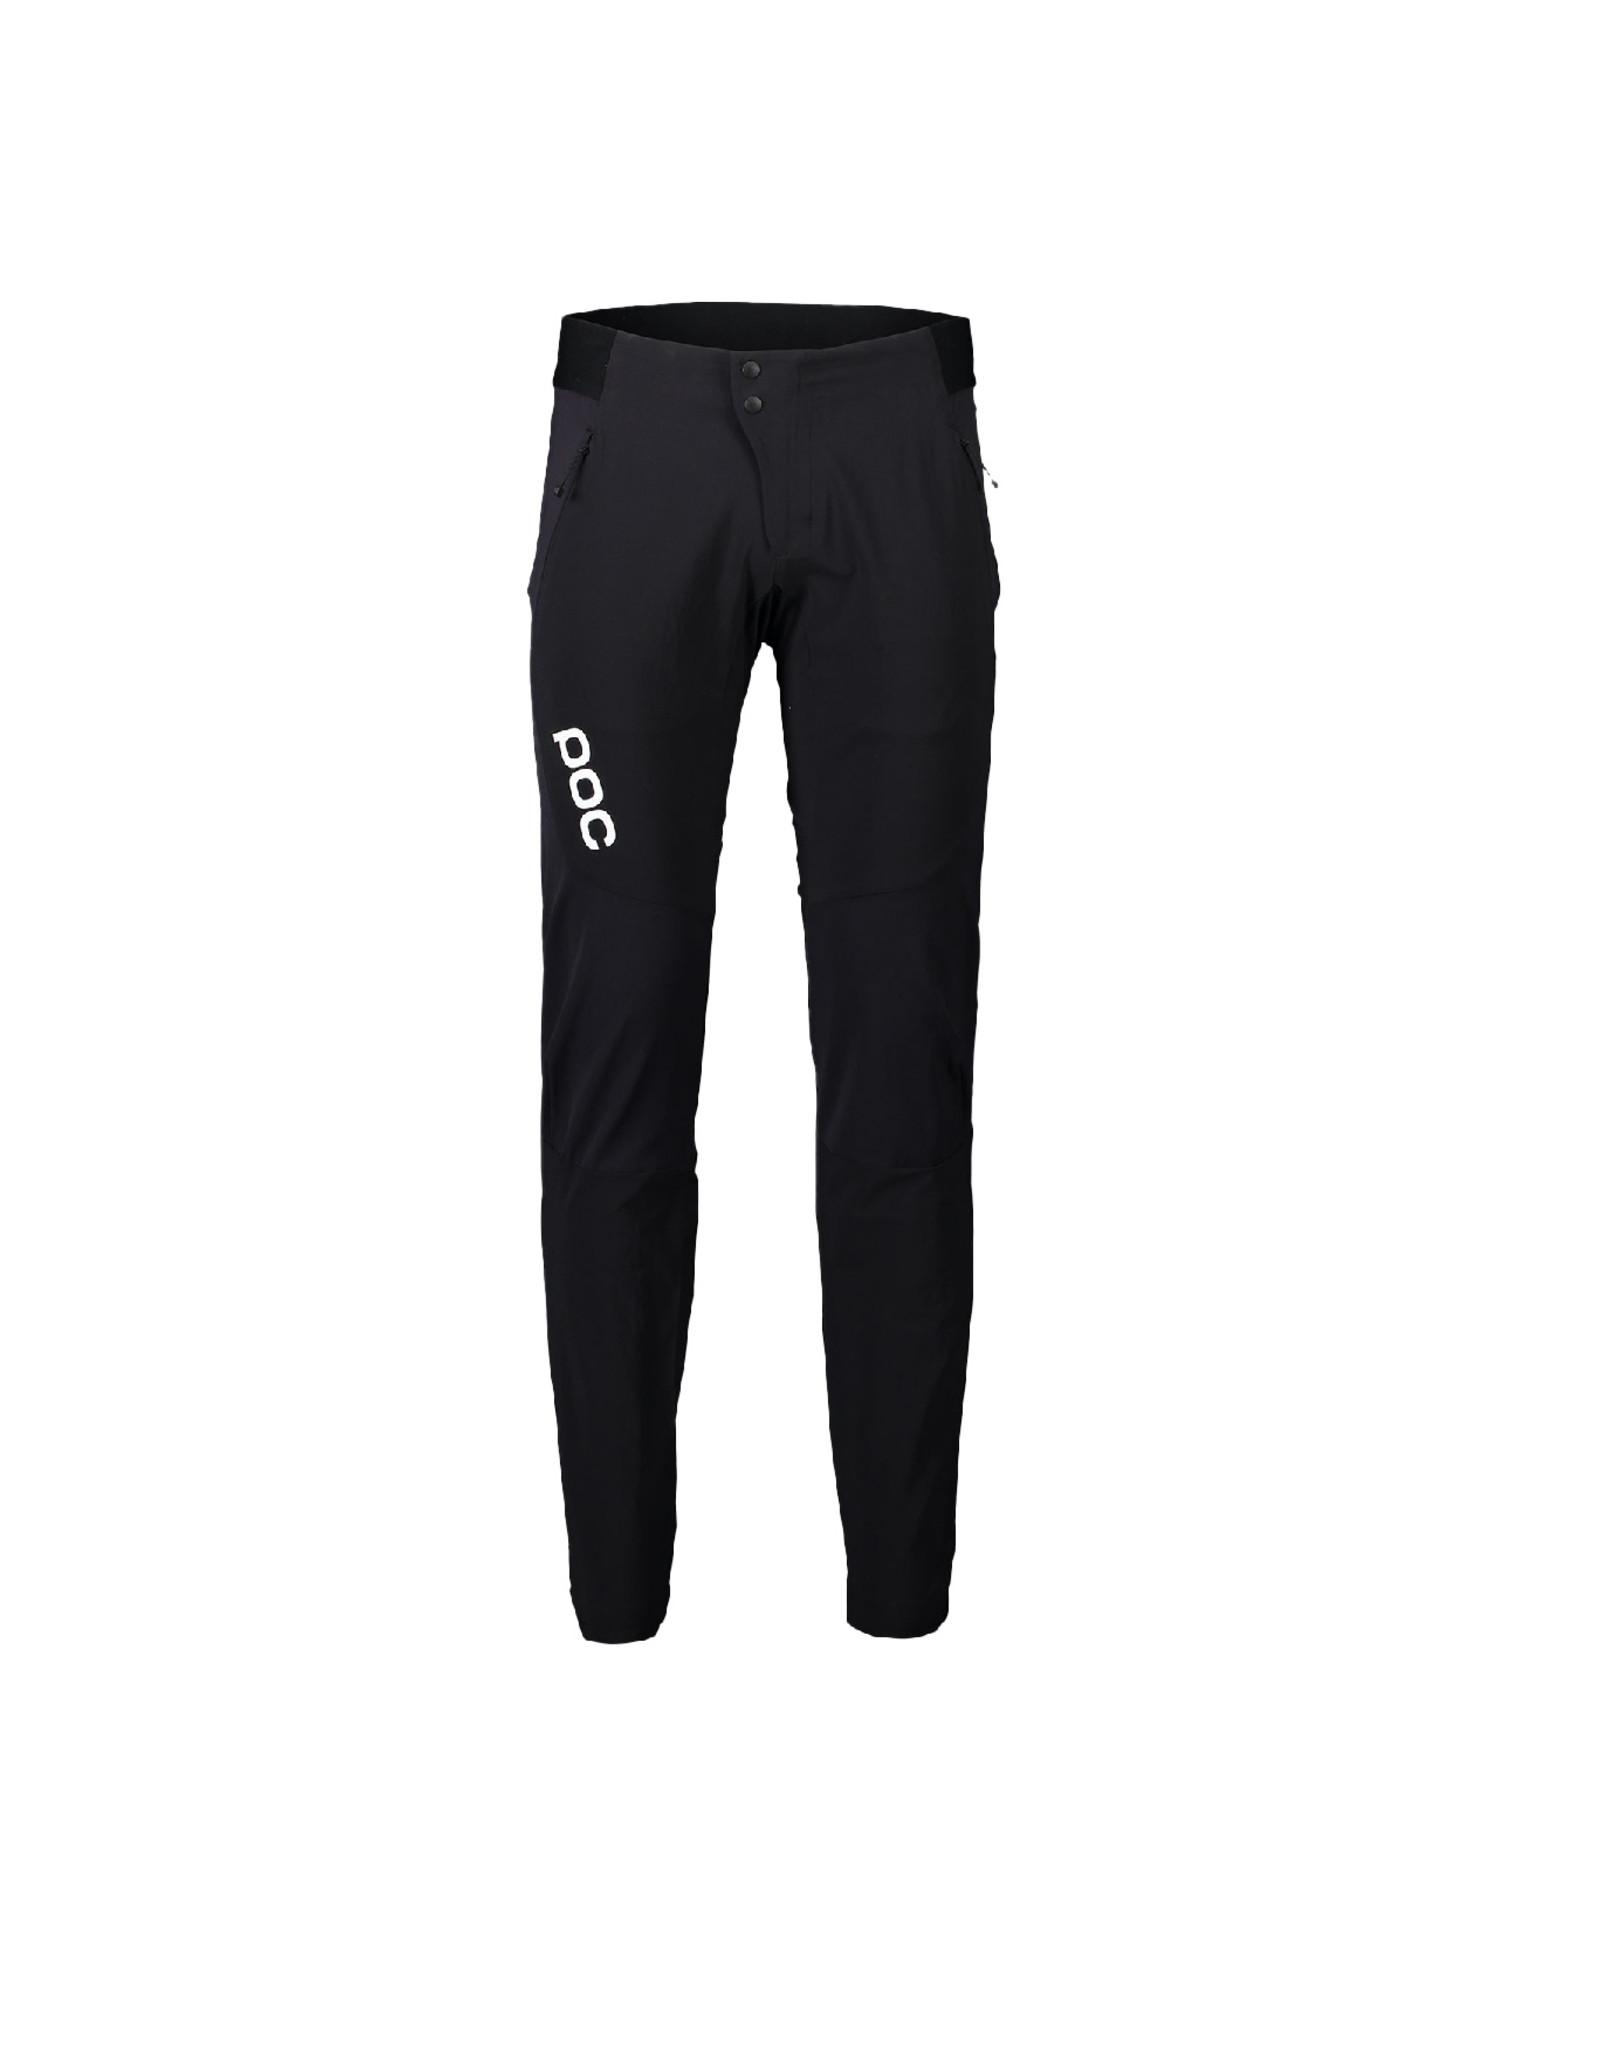 POC POC Pantalons Rhythm Resistance